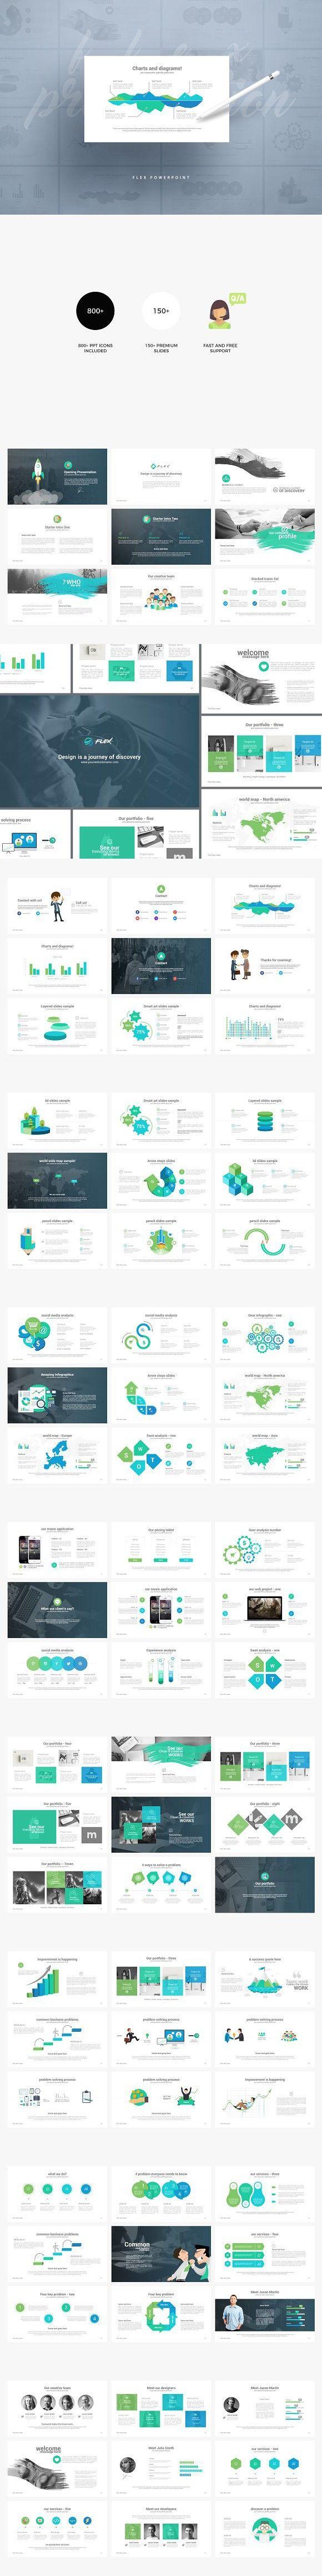 delighted flex templates ideas - resume ideas - namanasa, Presentation templates